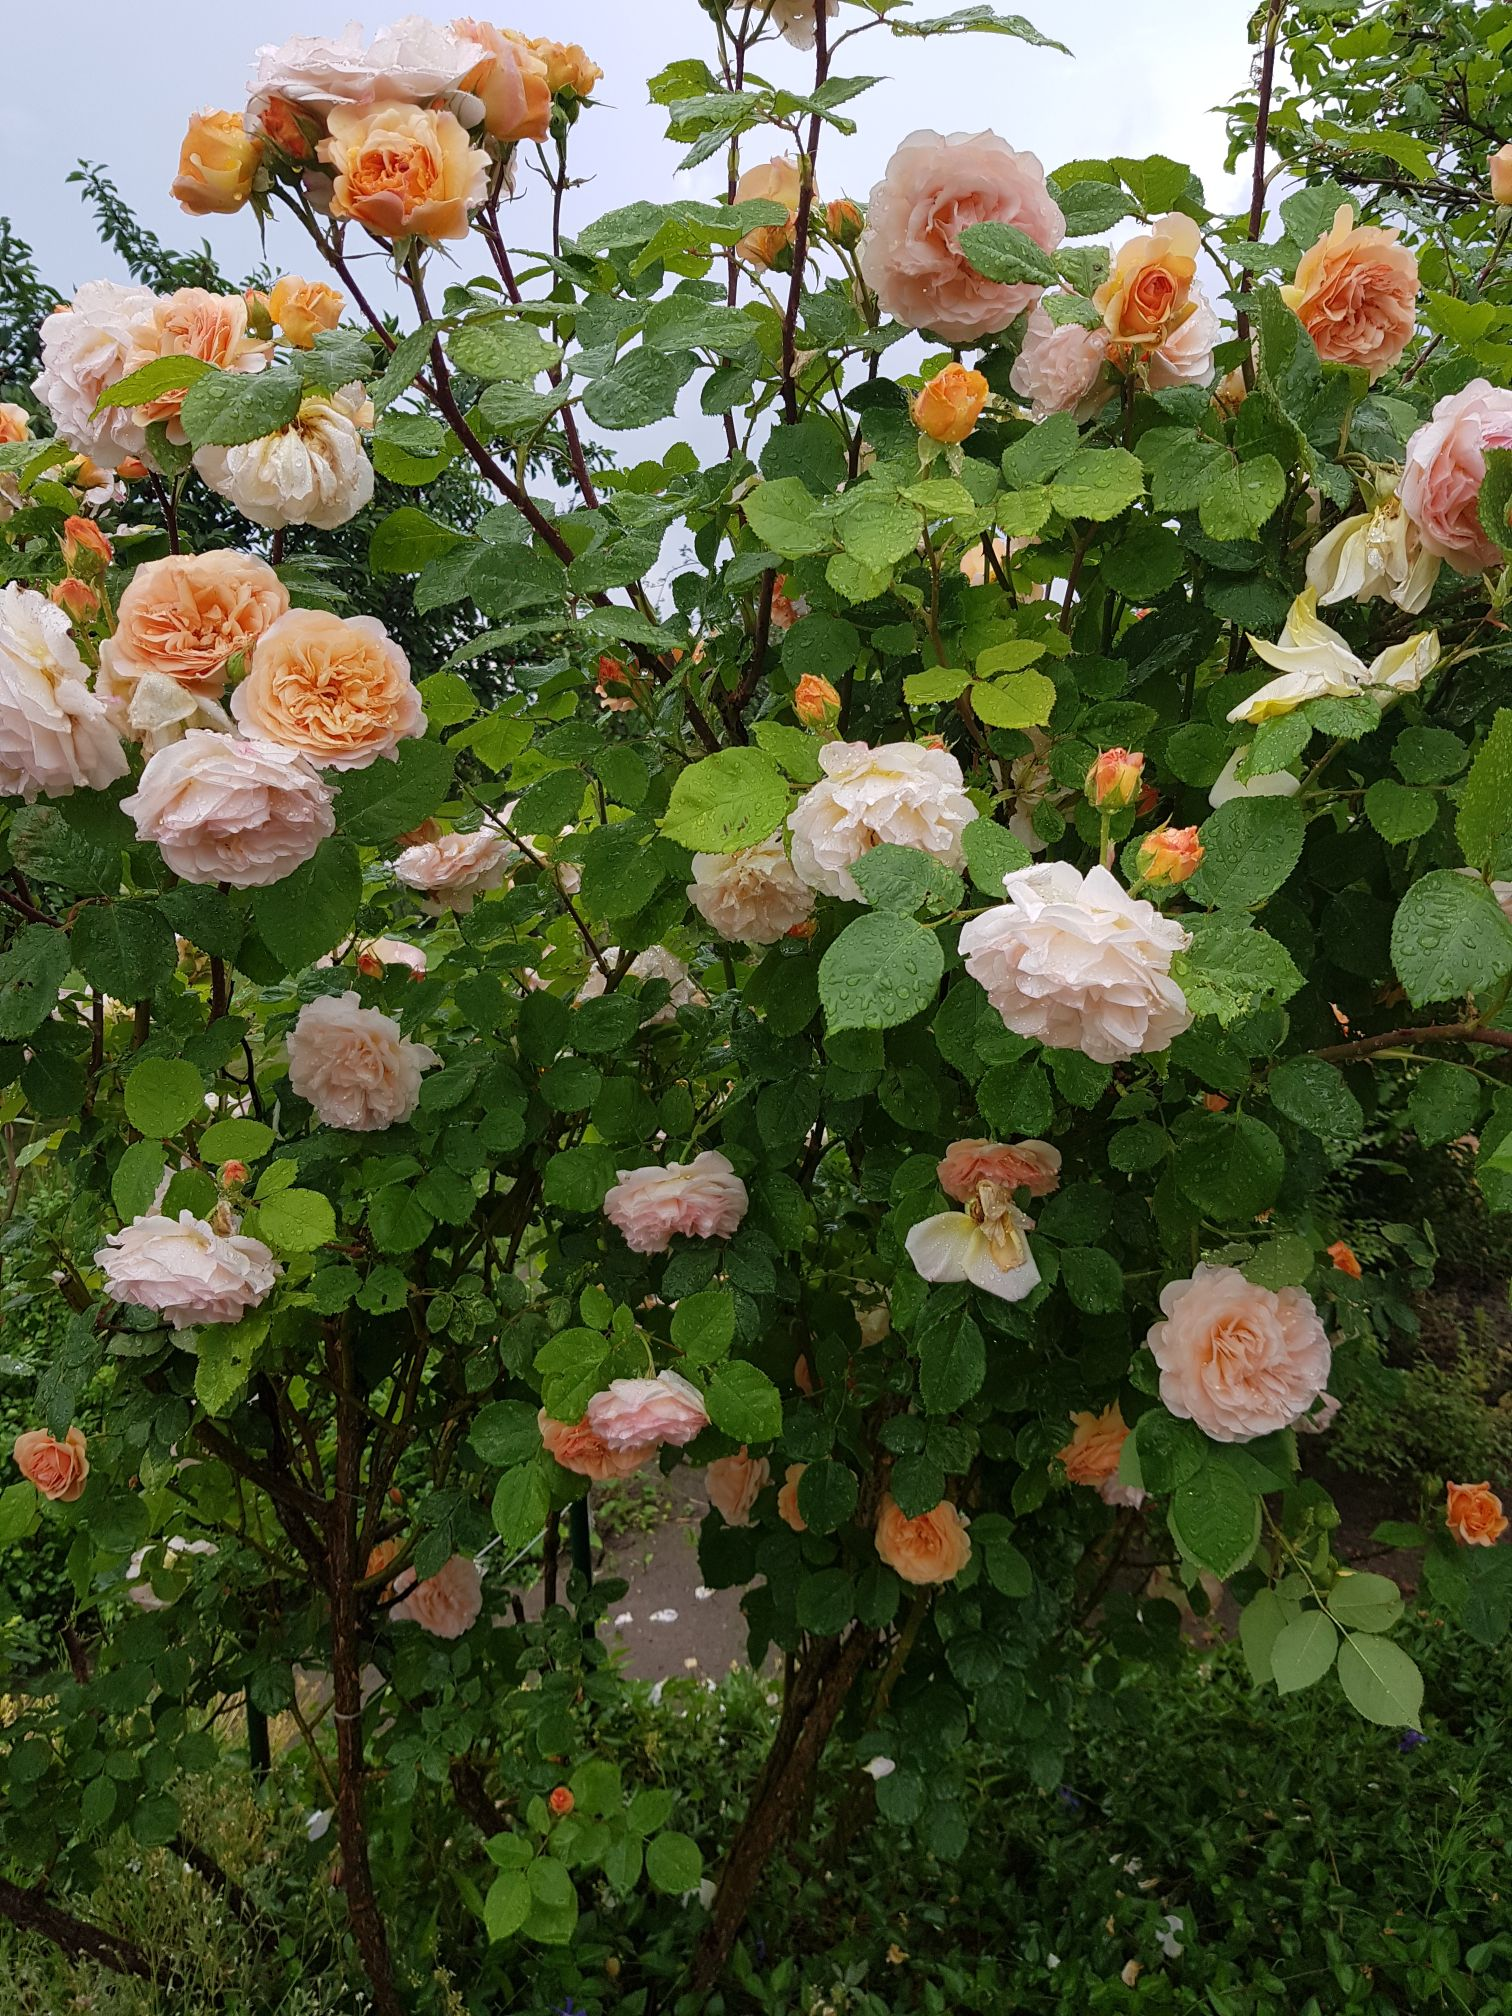 obcinanie róż